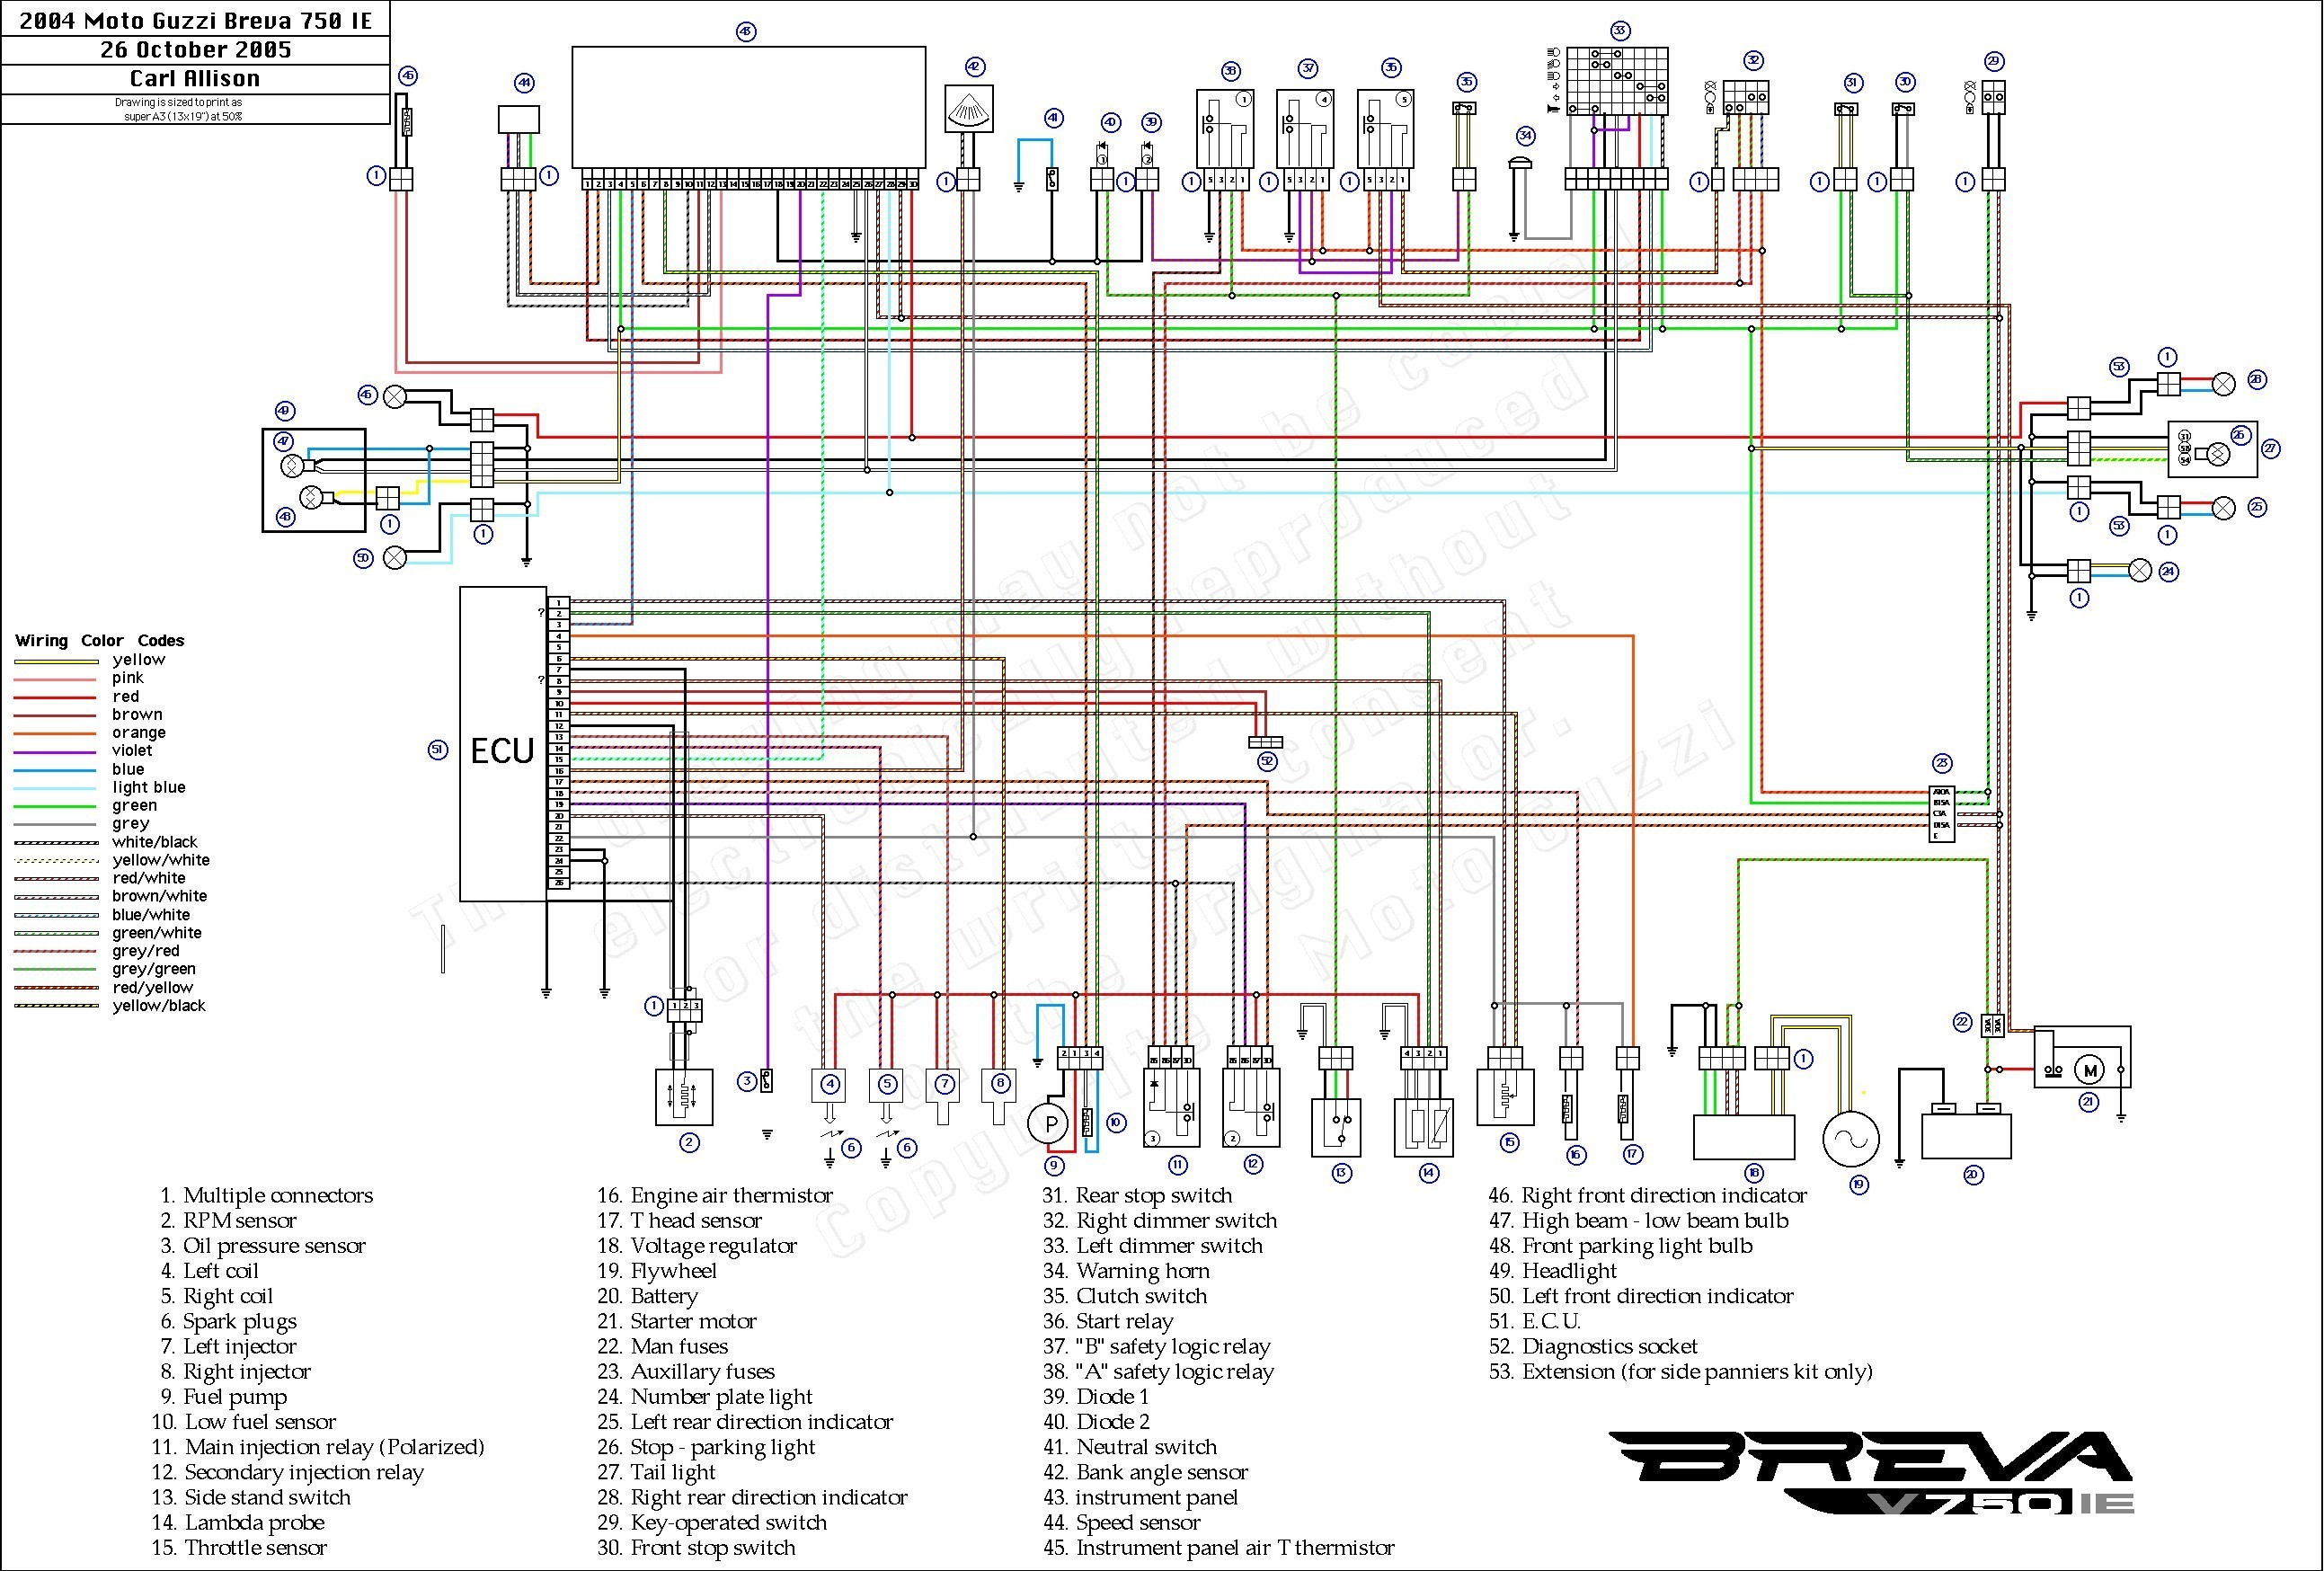 2002 dodge ram 1500 4 7 engine diagram 2004 dodge ram wiring diagram copy wiring diagram dodge ram 1500 of 2002 dodge ram 1500 4 7 engine diagram